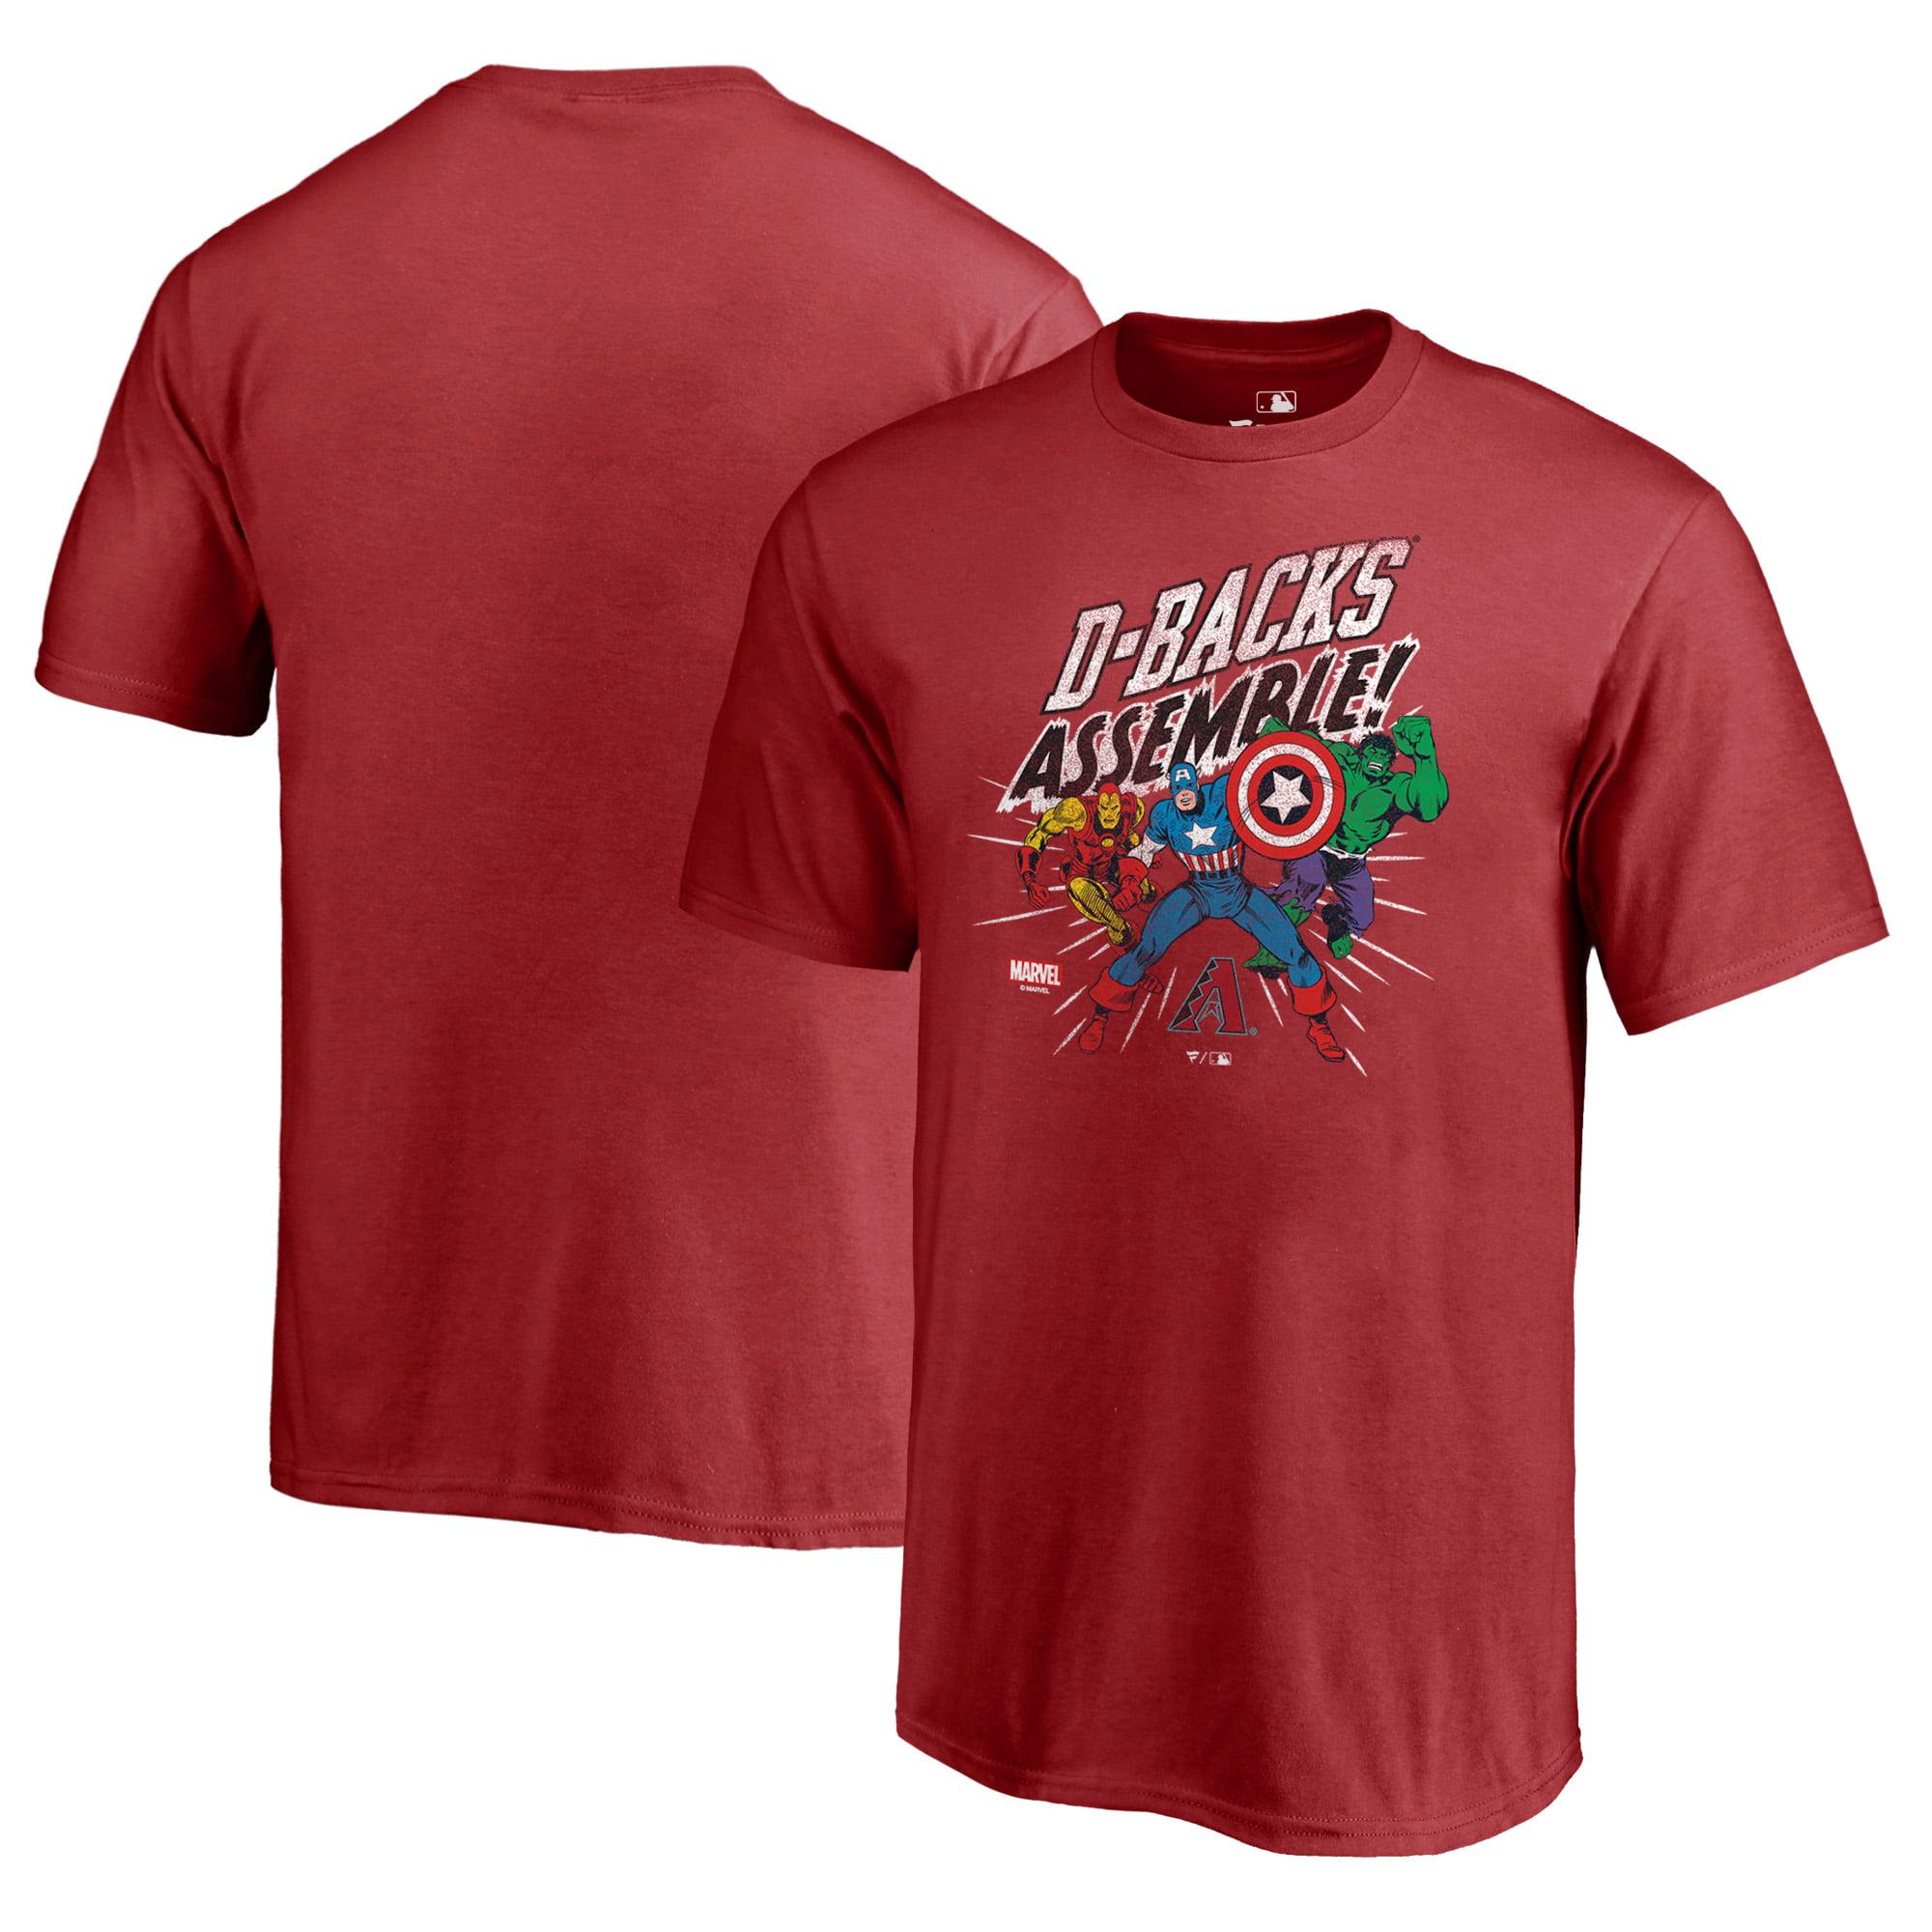 Arizona Diamondbacks Fanatics Branded Youth Marvel Avengers Assemble T-Shirt - Red